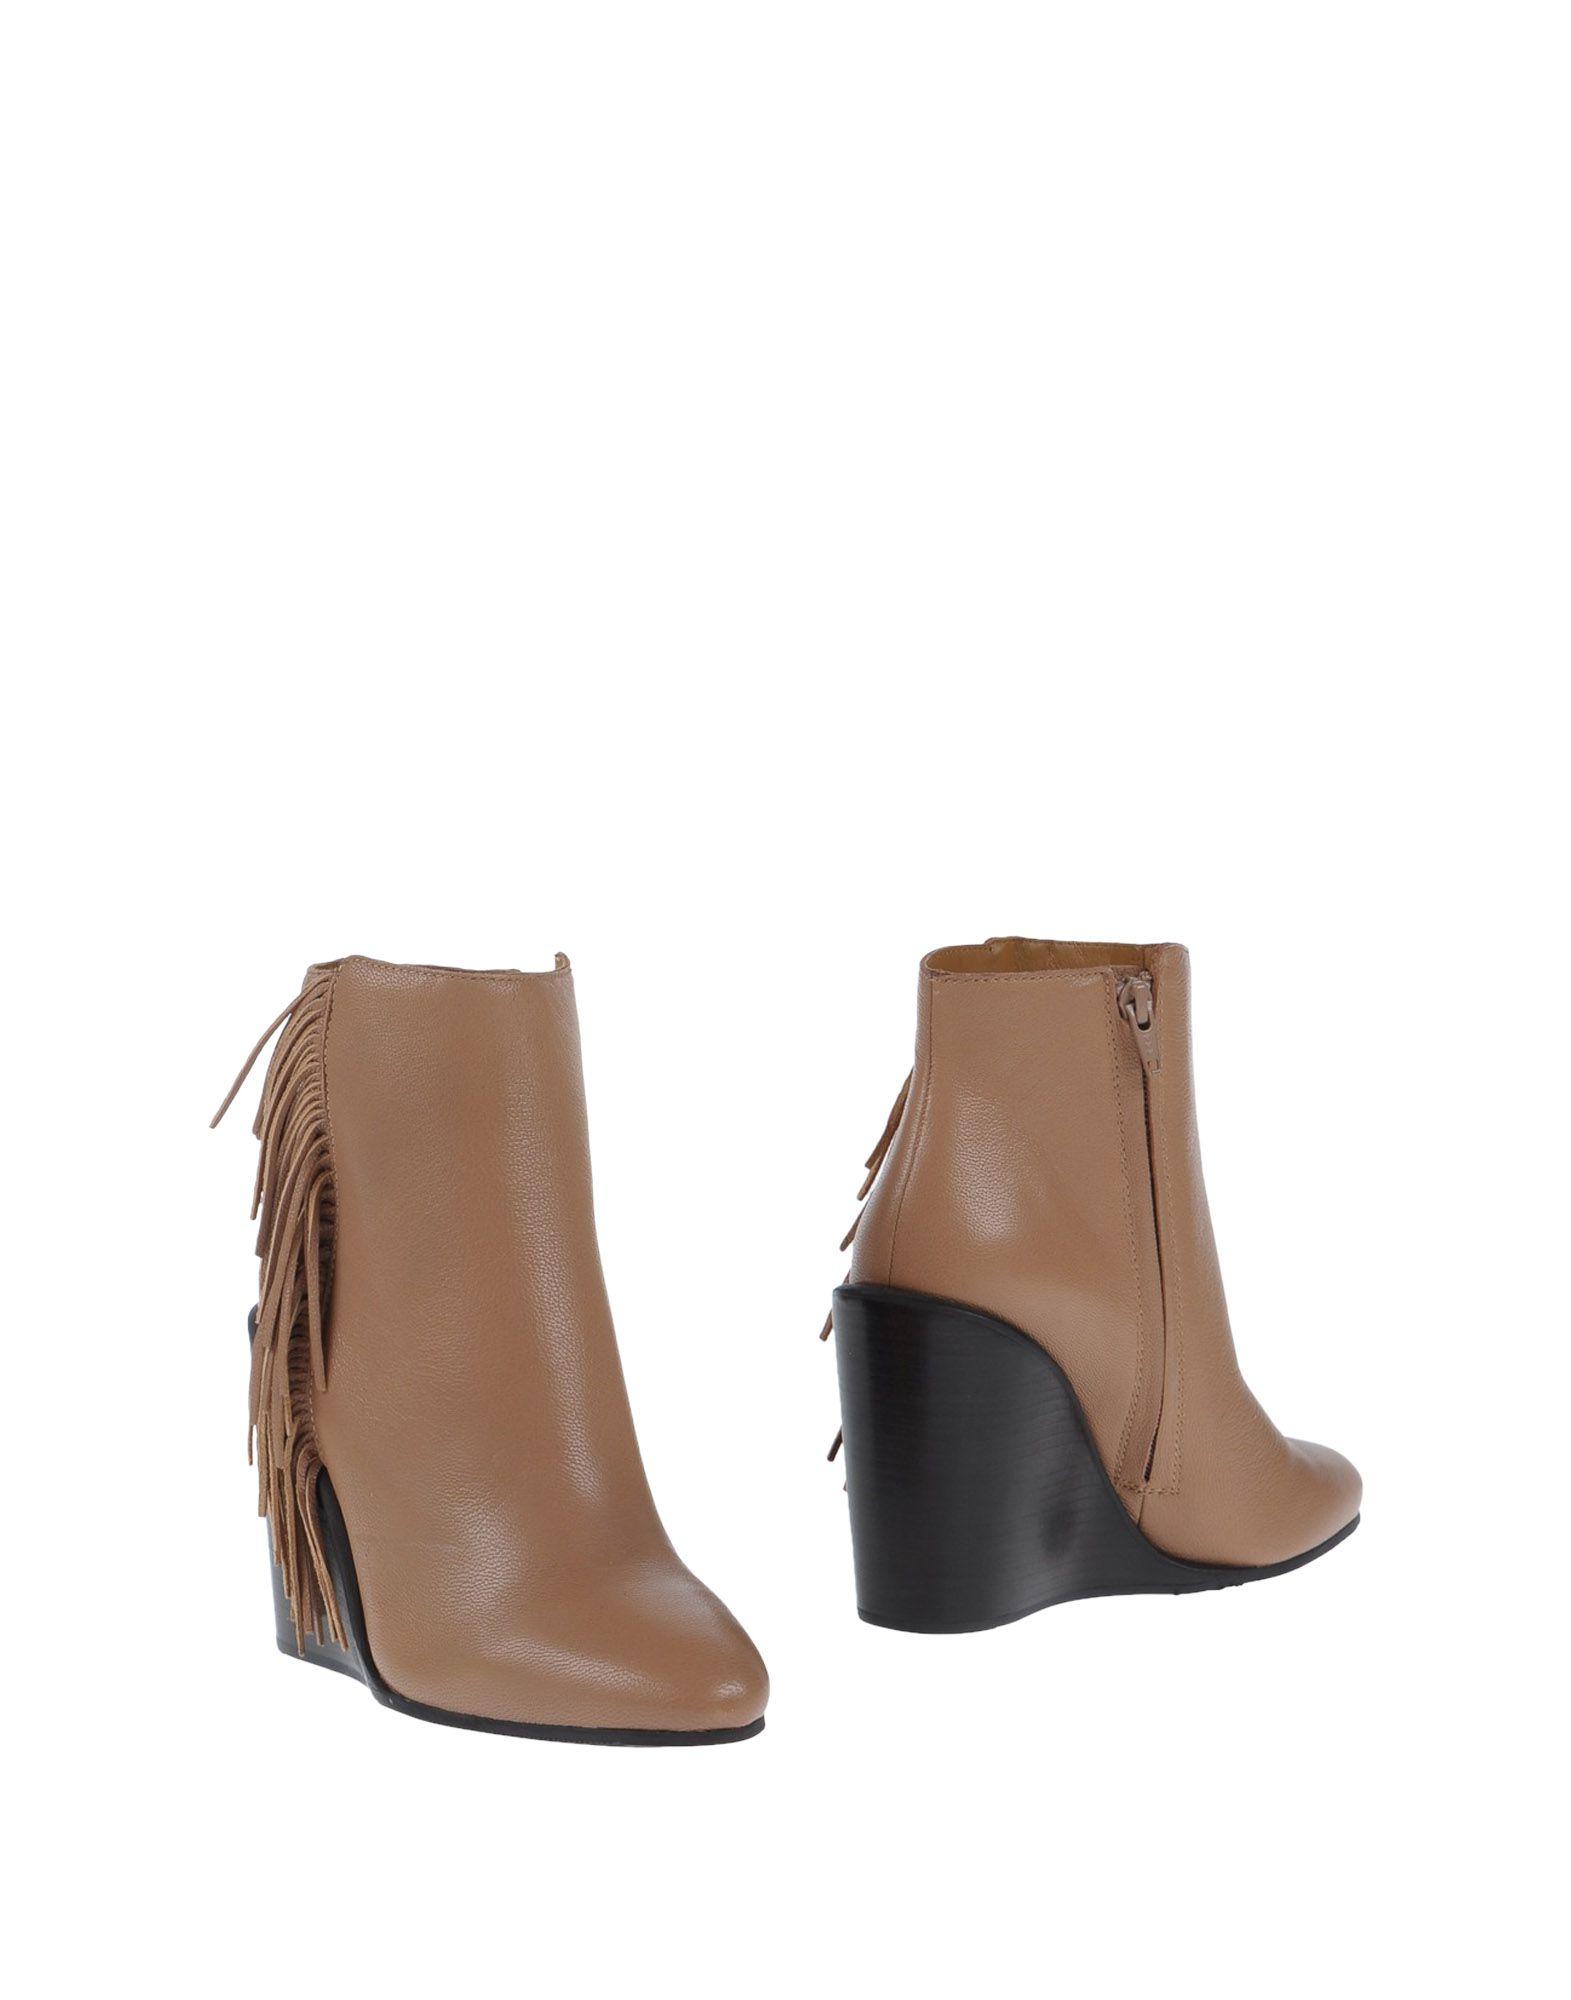 Rabatt Schuhe See By Chloé Stiefelette Damen  11075965PM